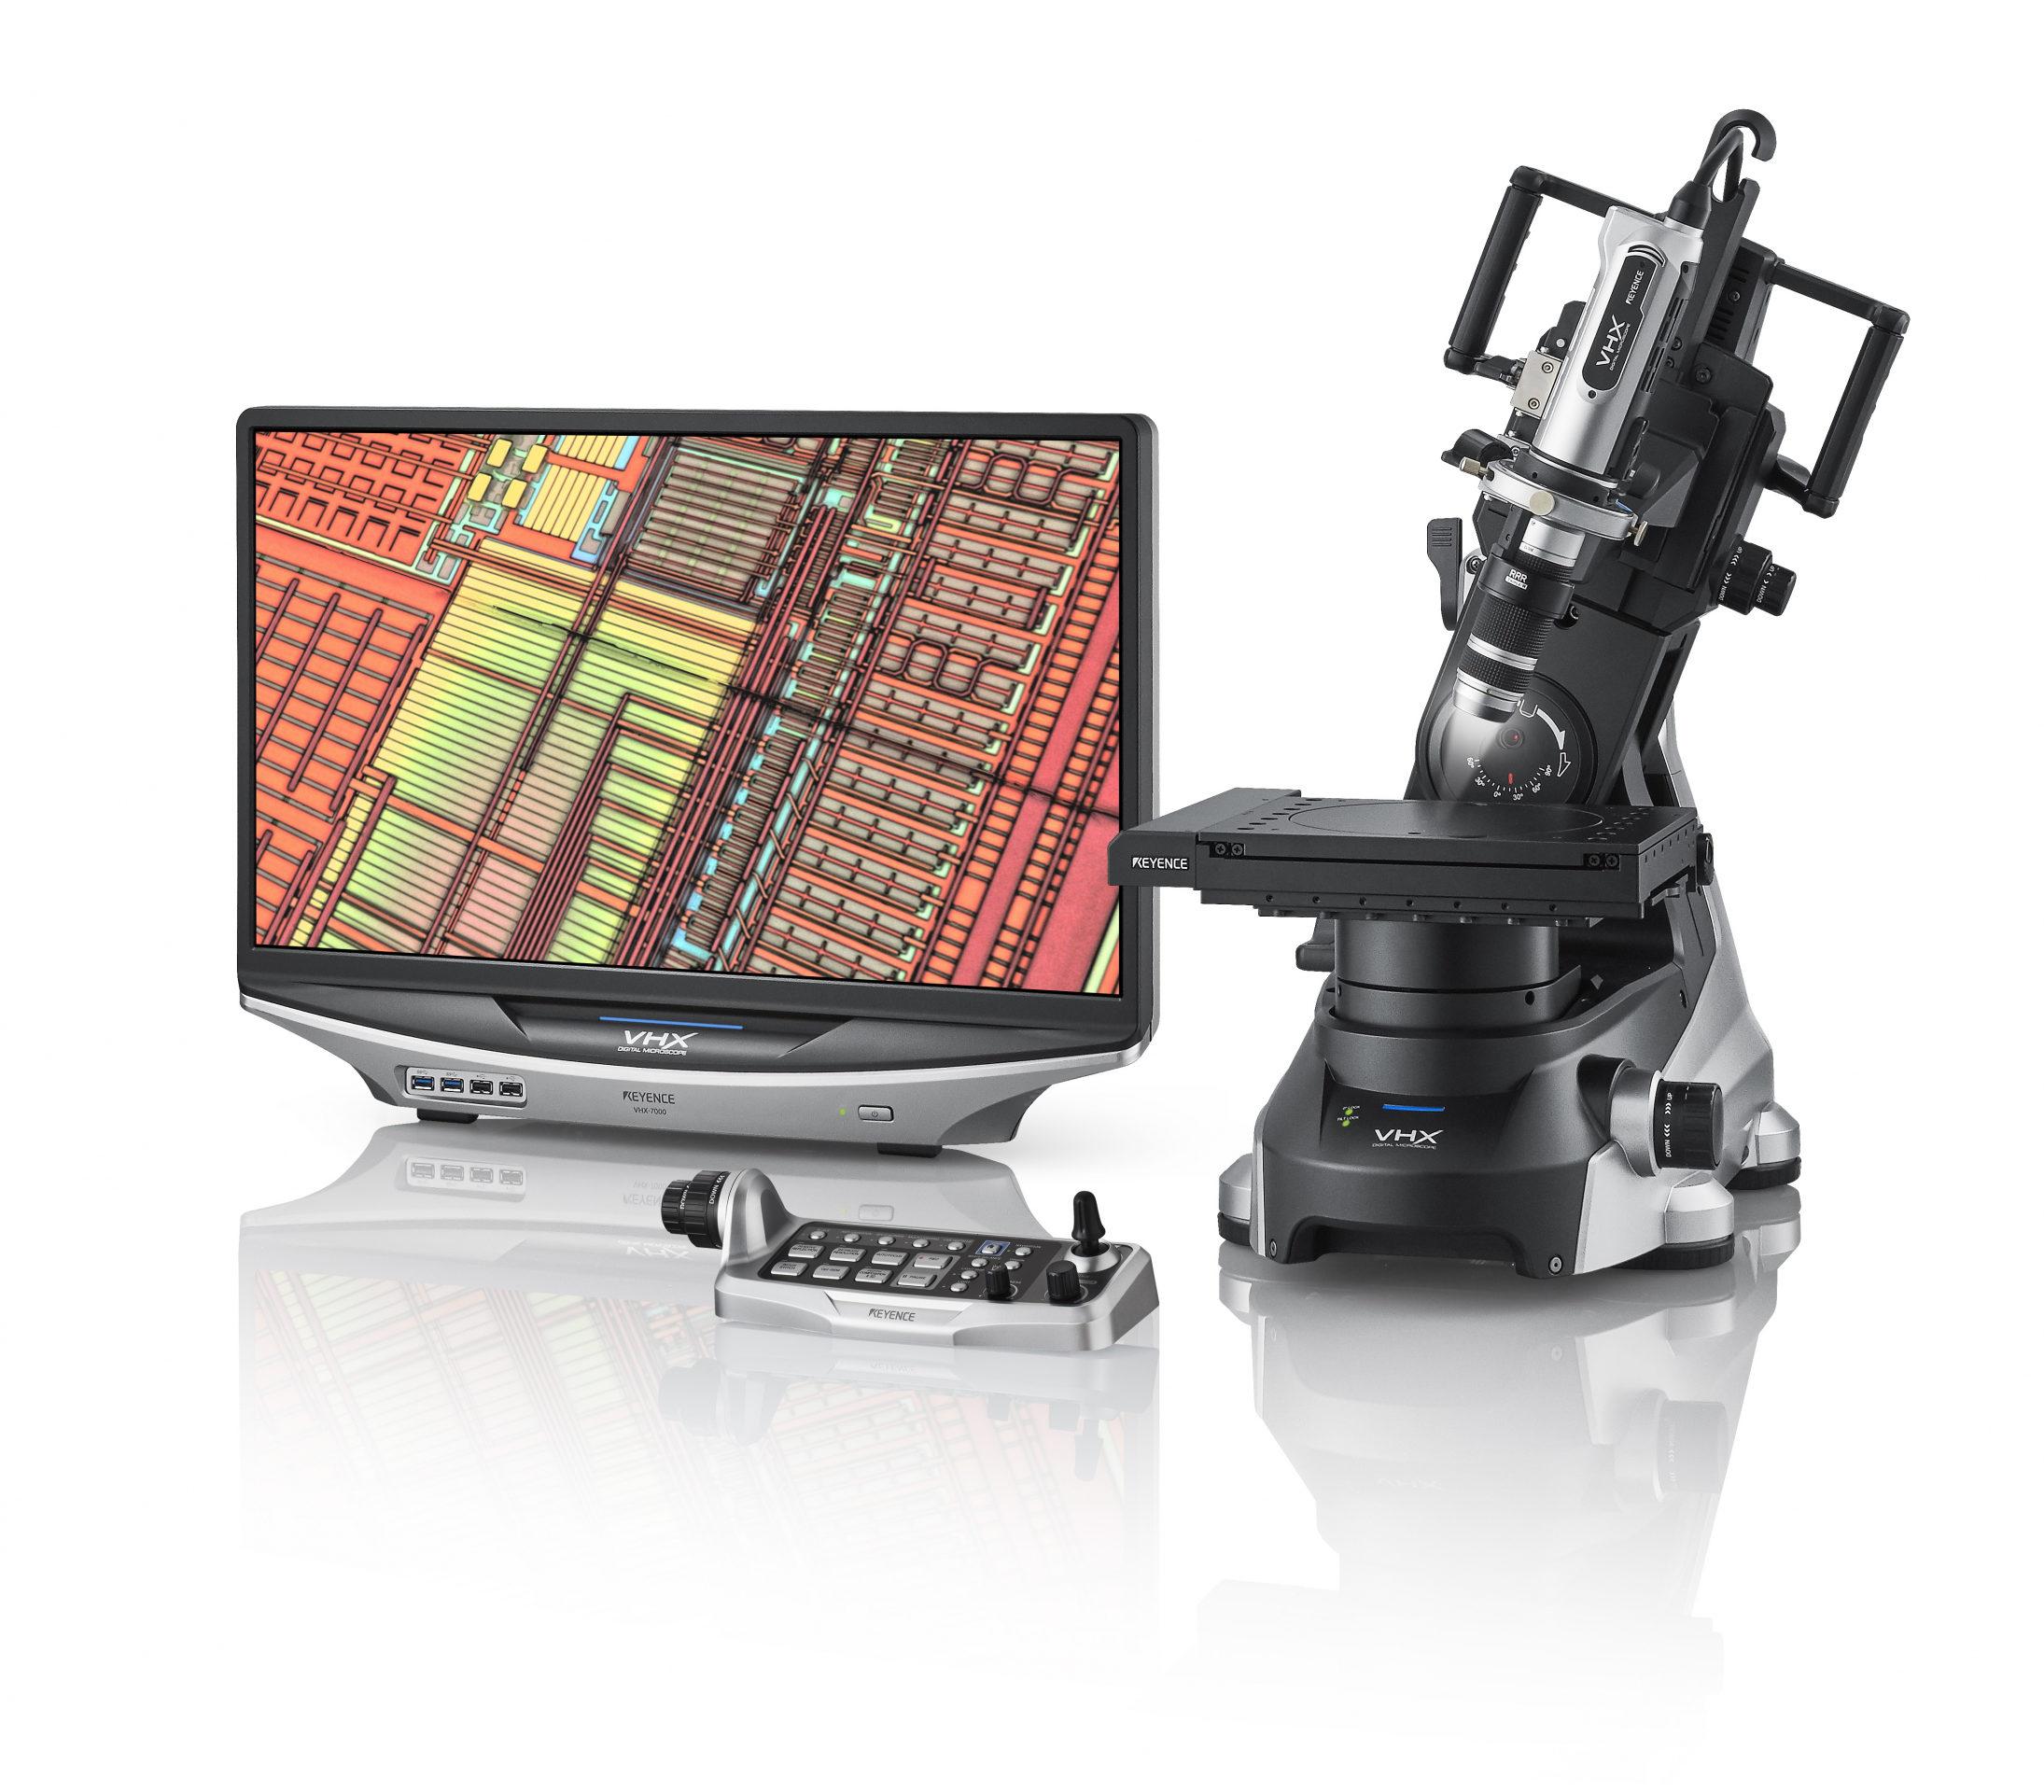 New Keyence VHX-7000 4K Microscope enhances view, capture and measure tasks